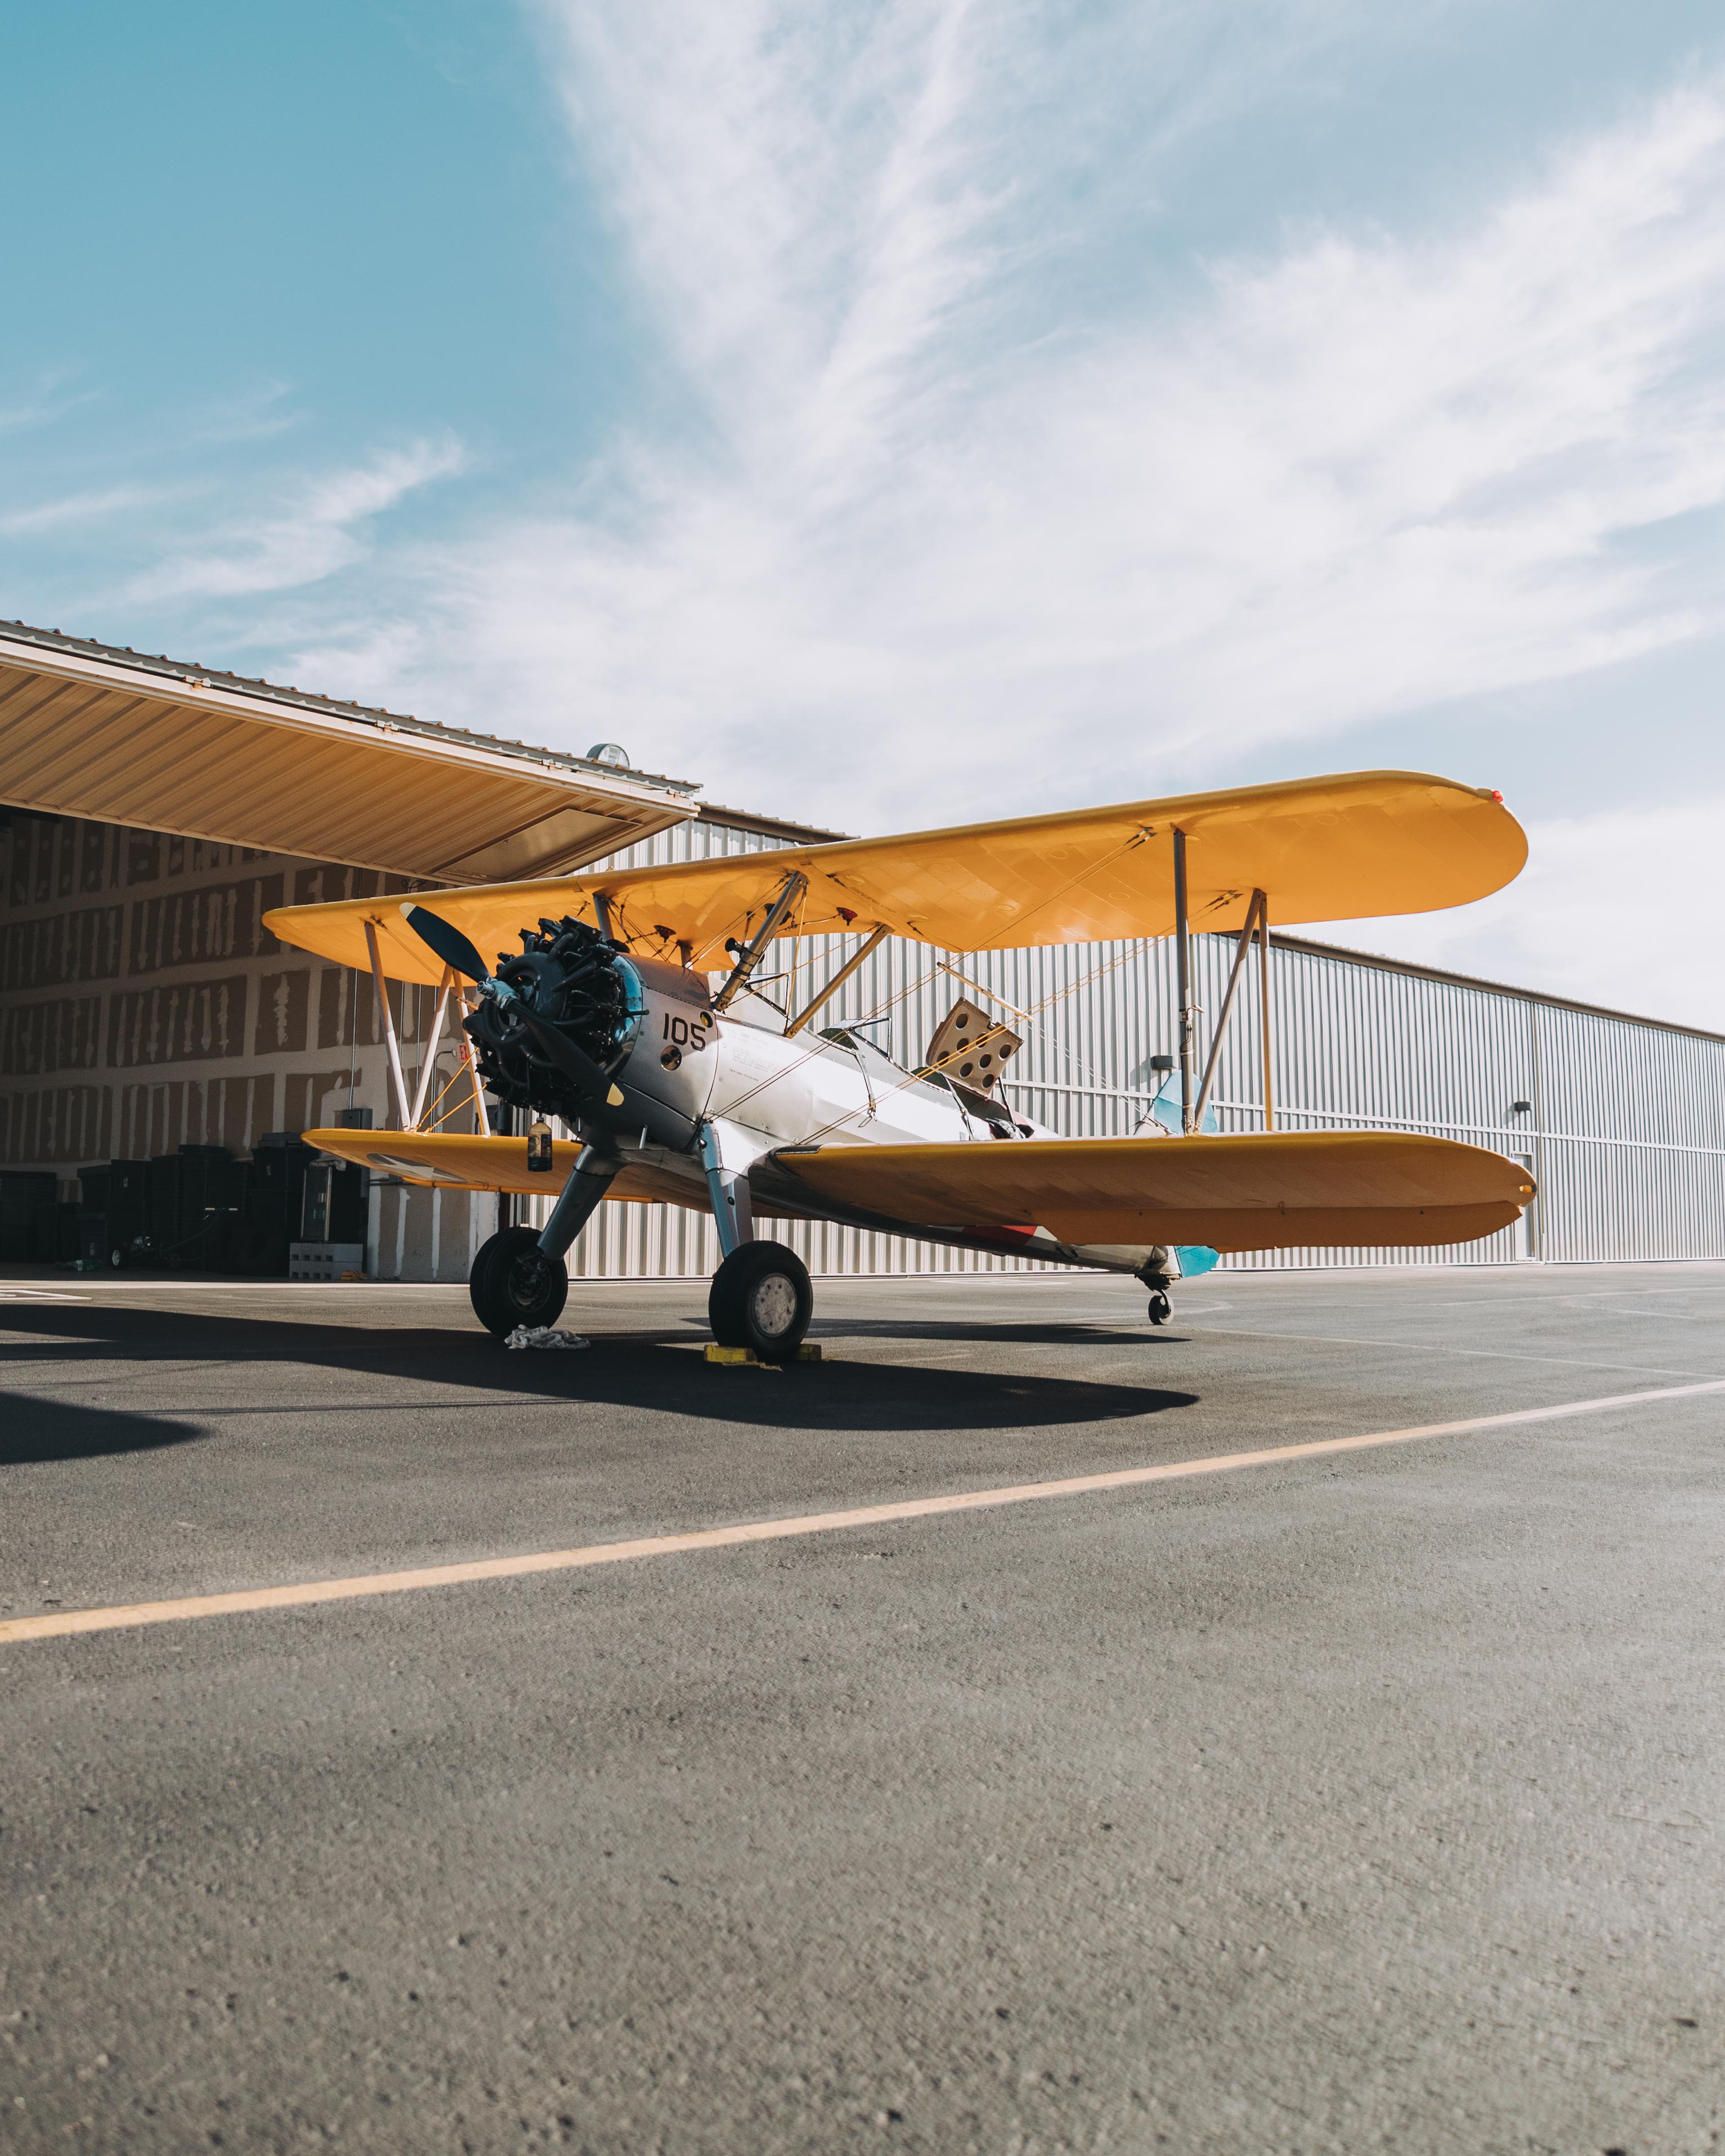 crop duster on runway in daytime